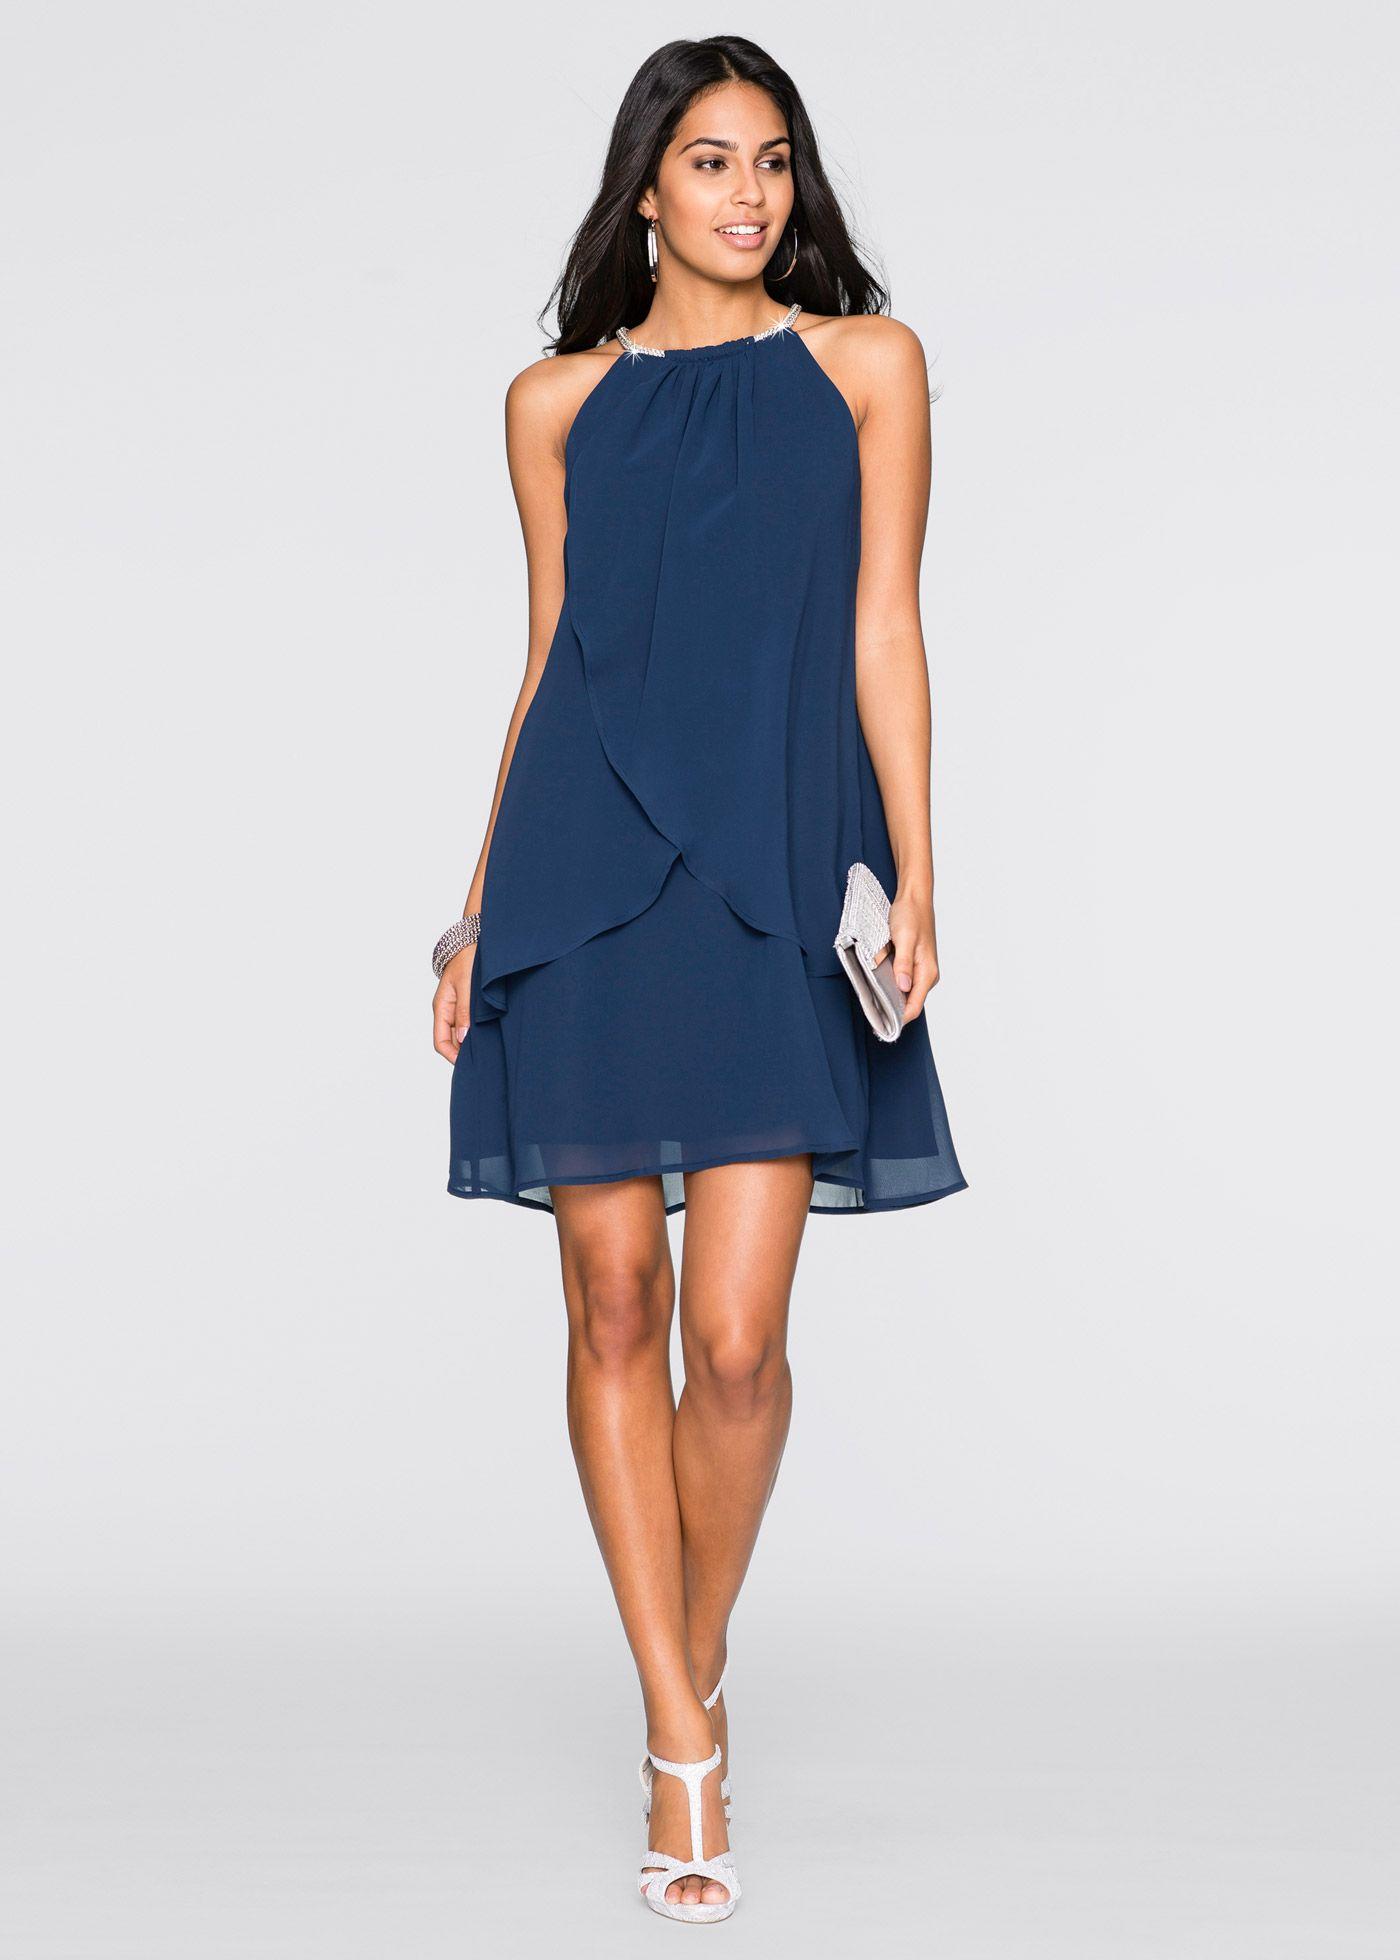 Robe en voile de chiffon avec collier bleu foncé - BODYFLIRT acheter online  - bonprix.fr d2ce561a27f9